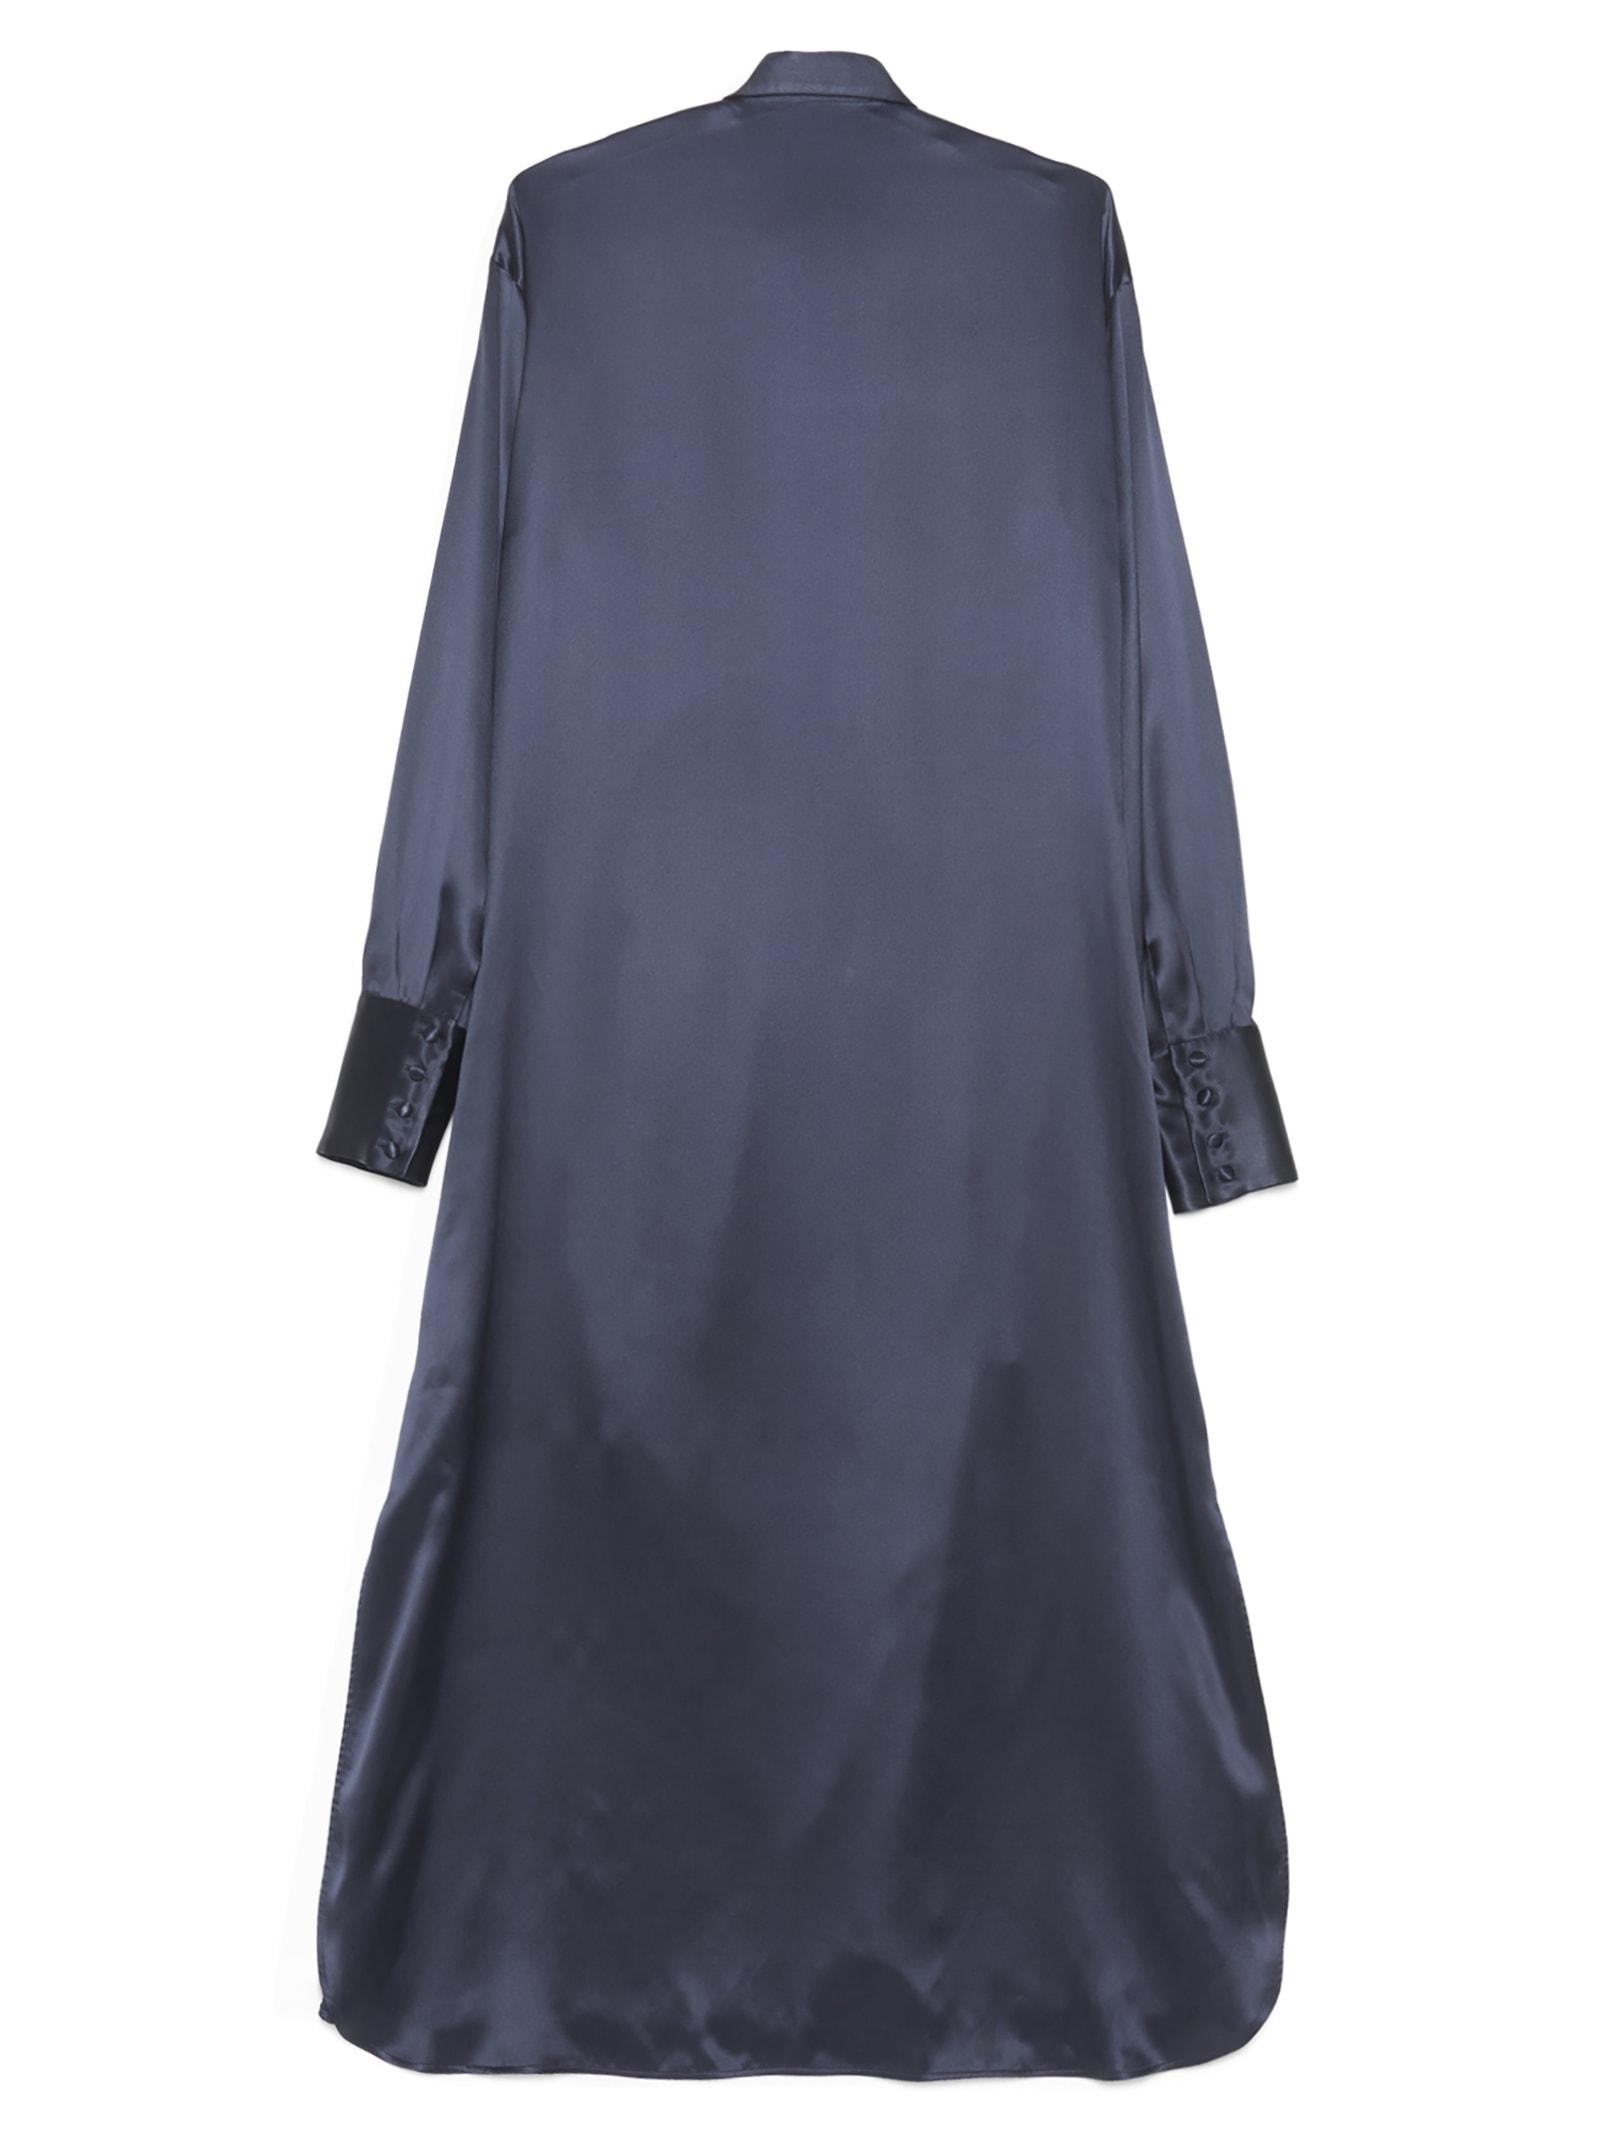 Buy Jil Sander melpomene Dress online, shop Jil Sander with free shipping